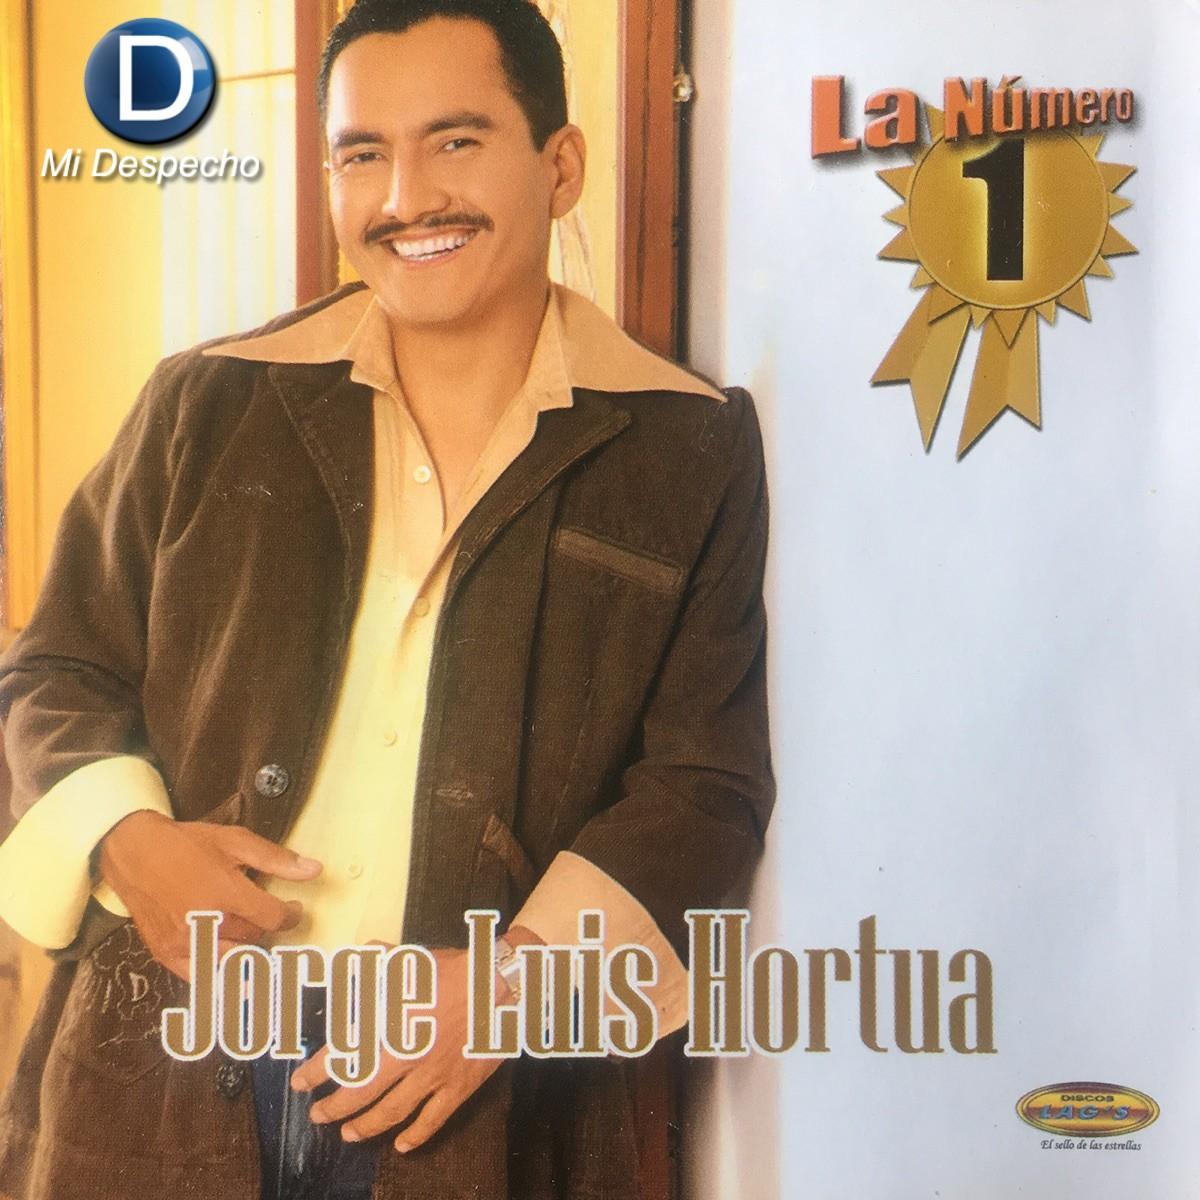 Jorge Luis Hortua La Numero 1 Frontal